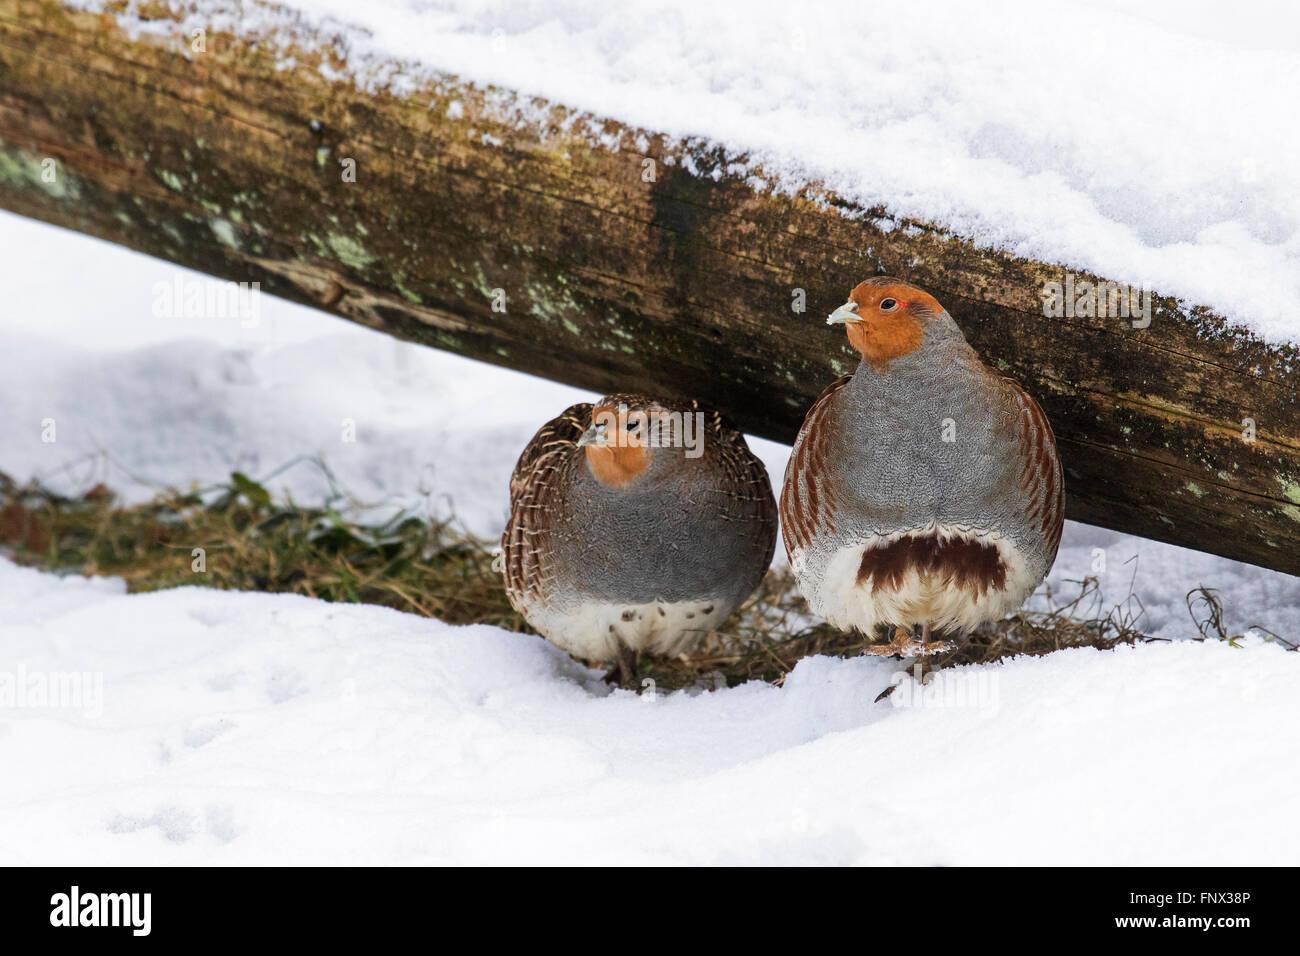 Grey partridges / English partridge (Perdix perdix) couple seeking shelter under log in the snow in winter - Stock Image